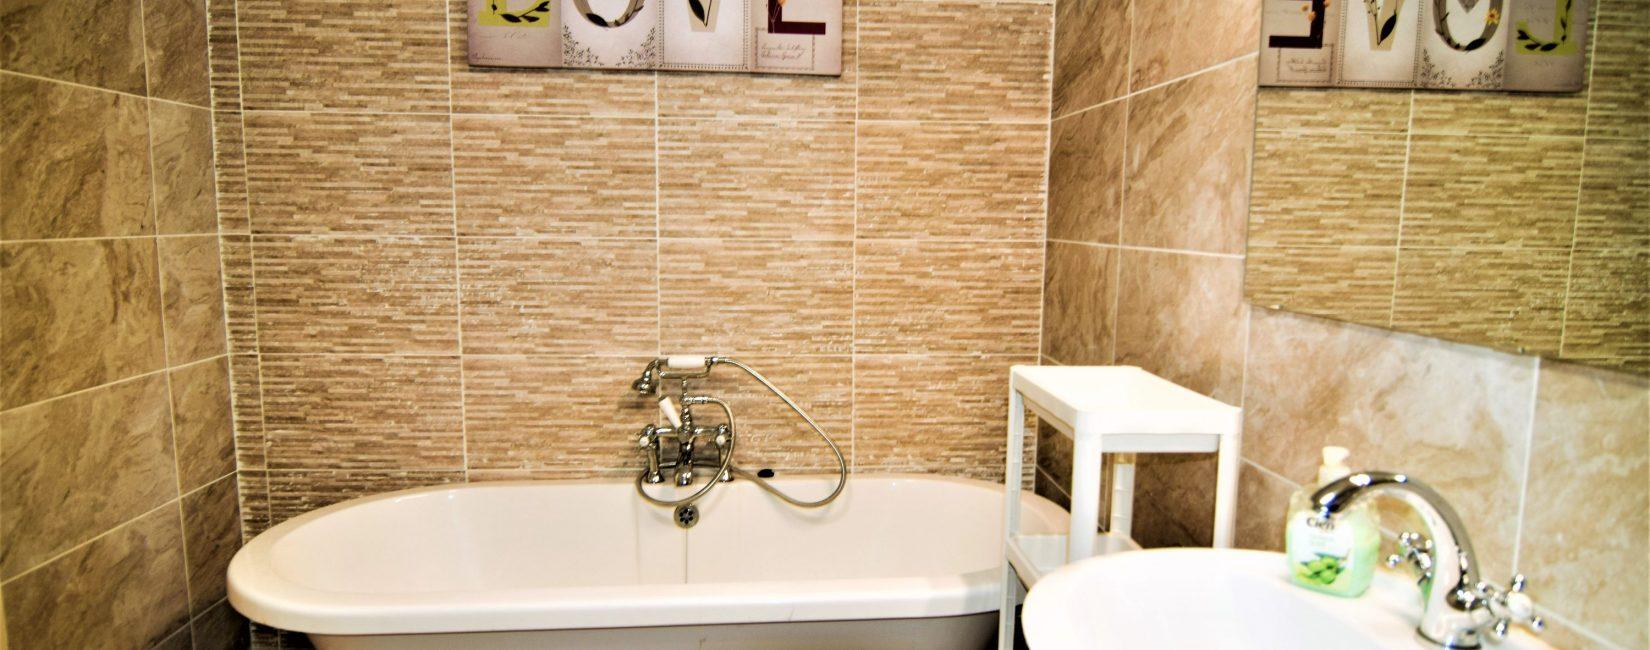 Bathtub + Separate Shower